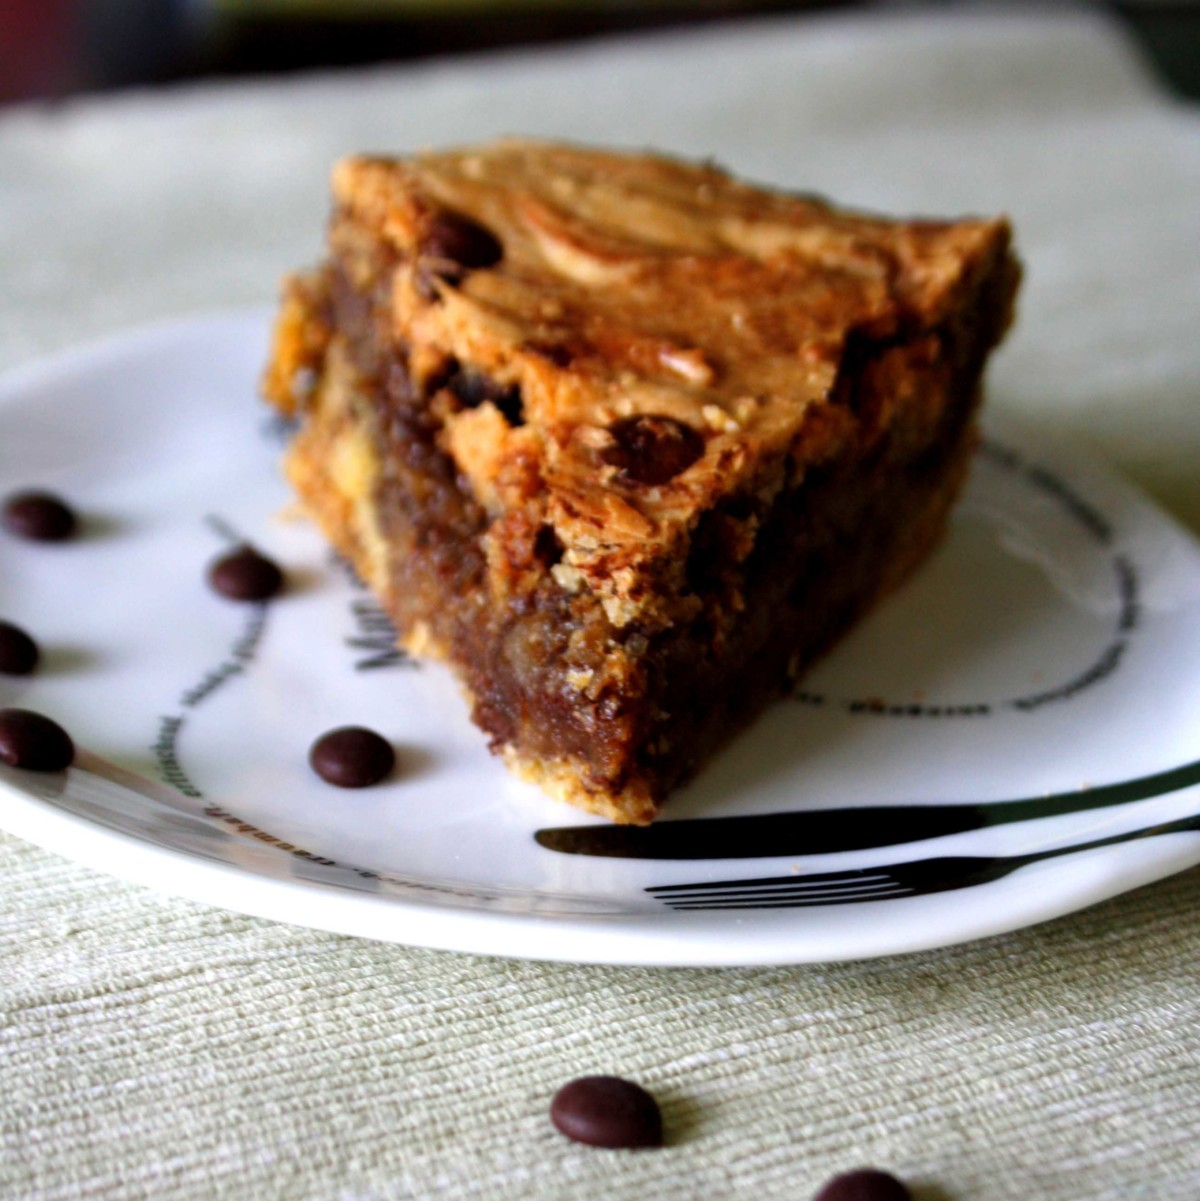 Keks im Topf // Cookie http://babyrockmyday.com/keks-im-topf/